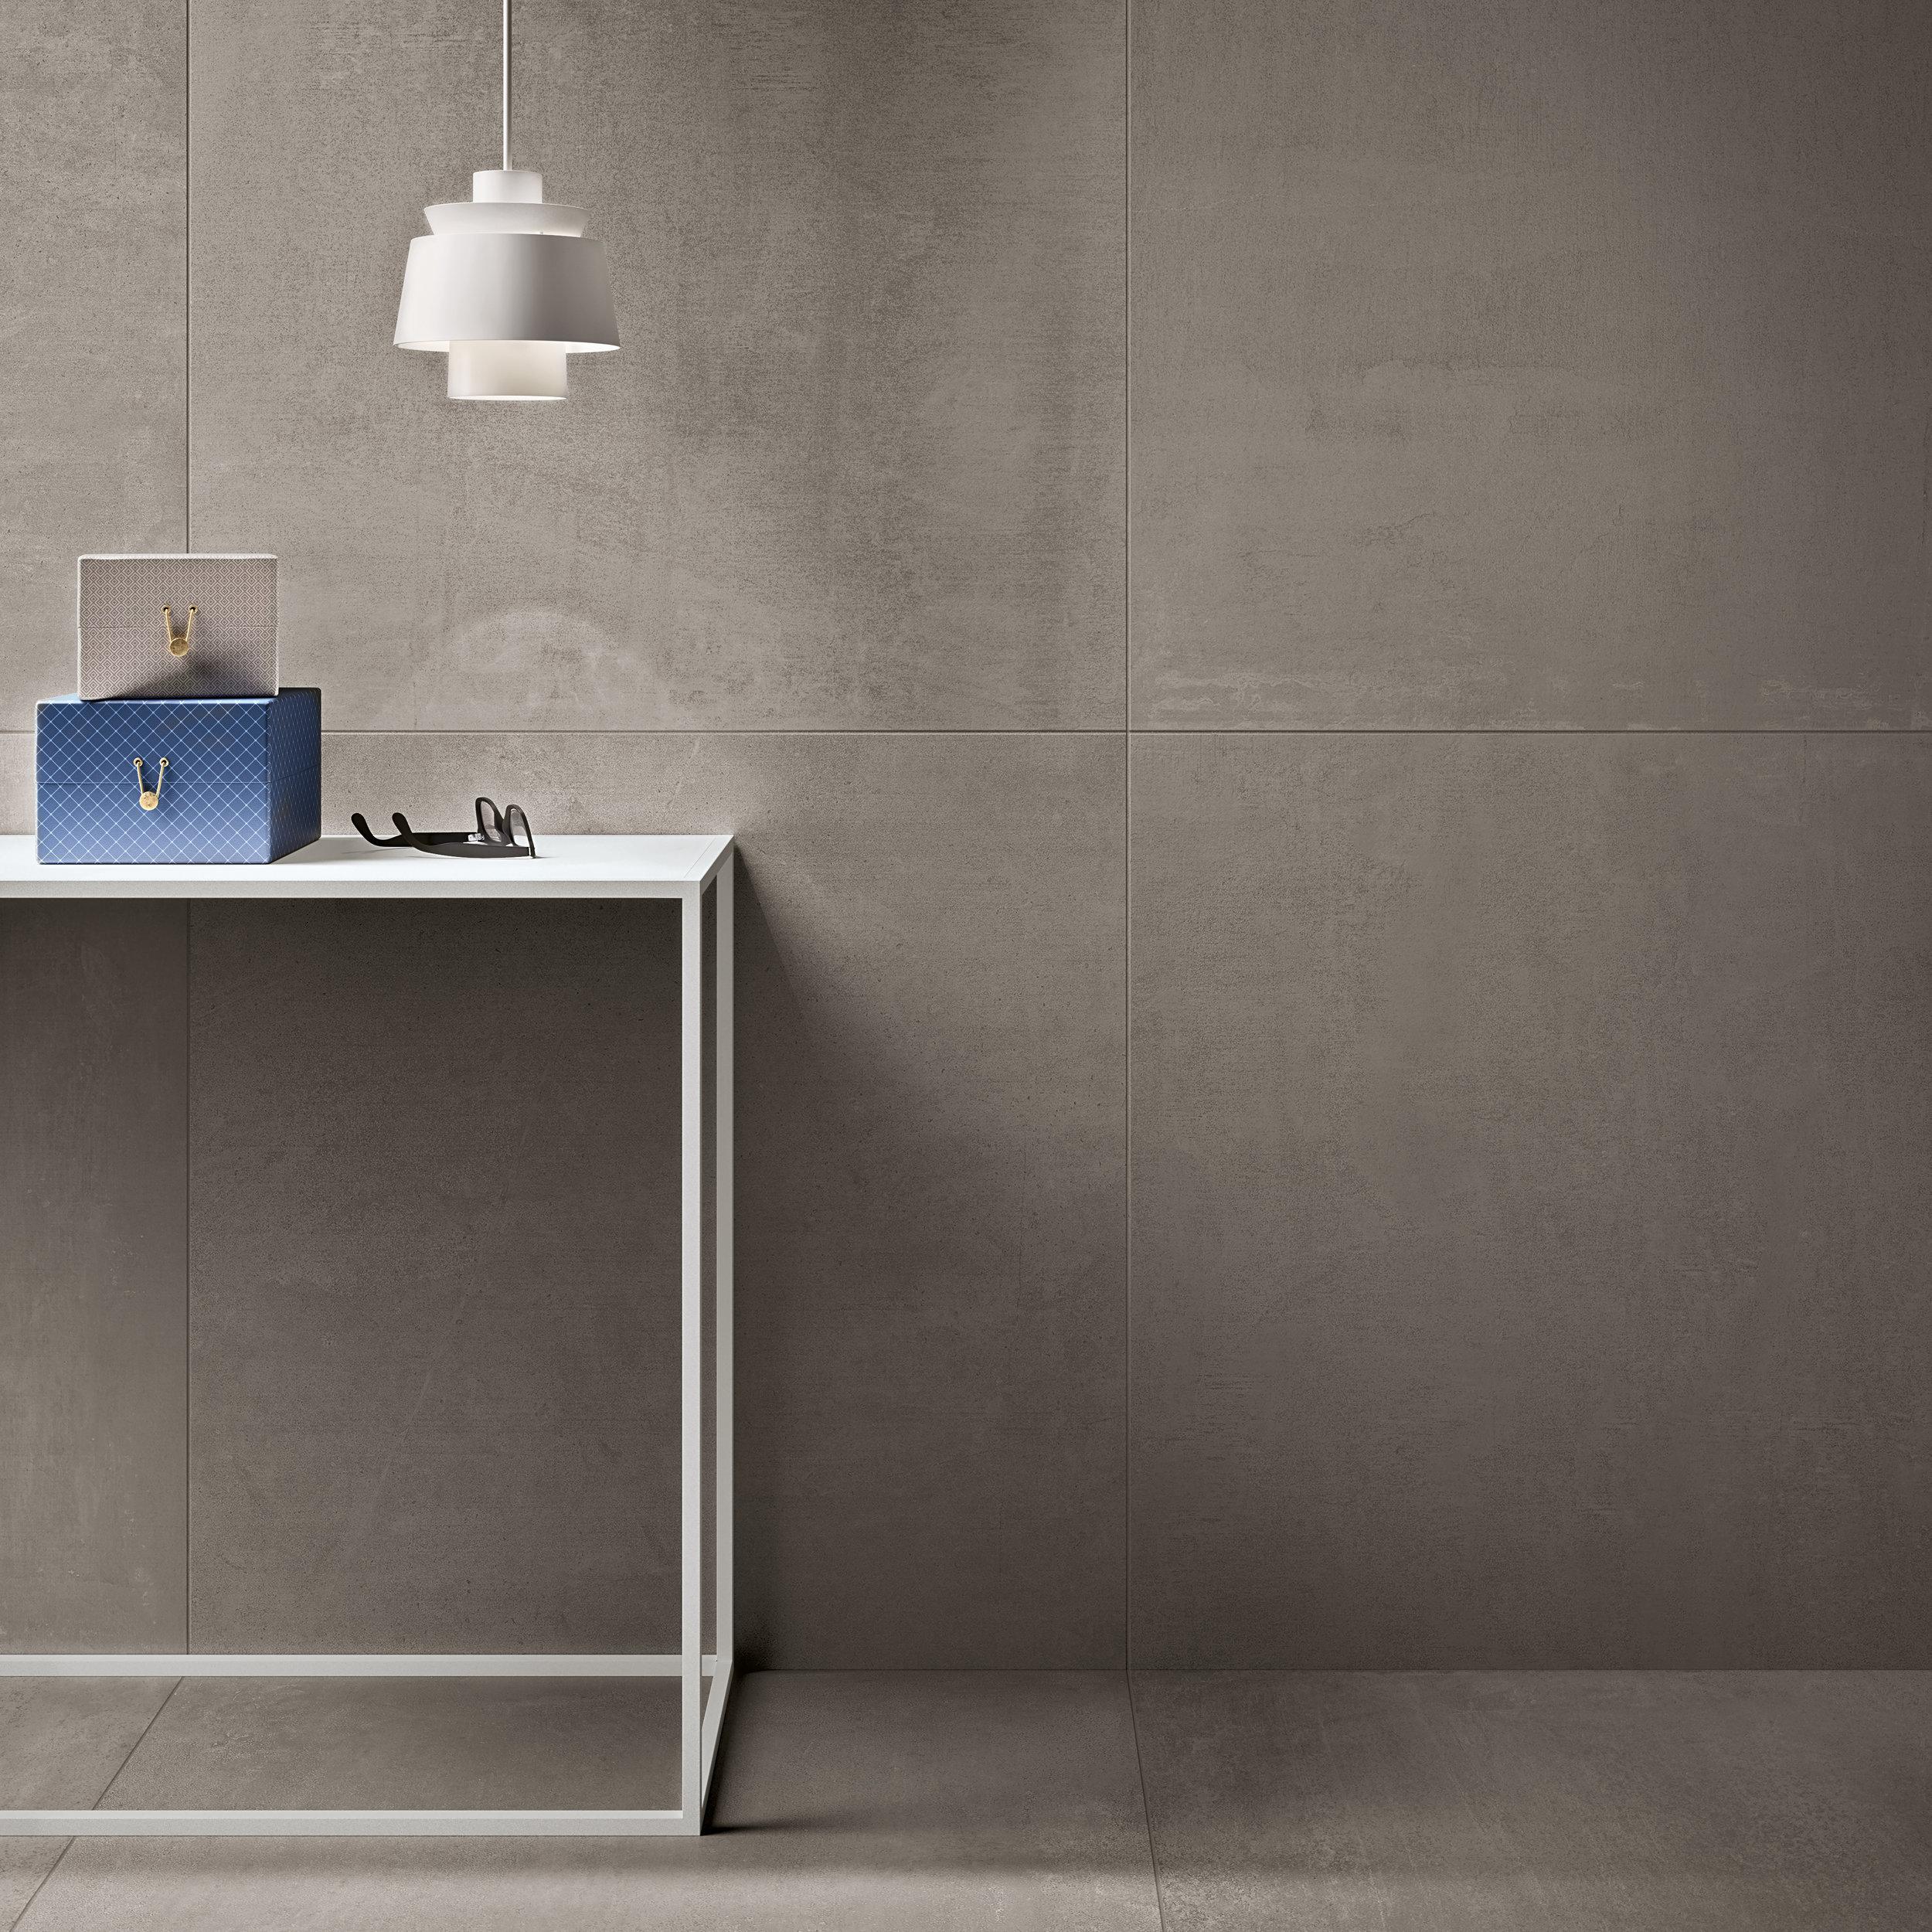 BLU-concretejungle-pub49-natural-11mm-shop-001.jpg